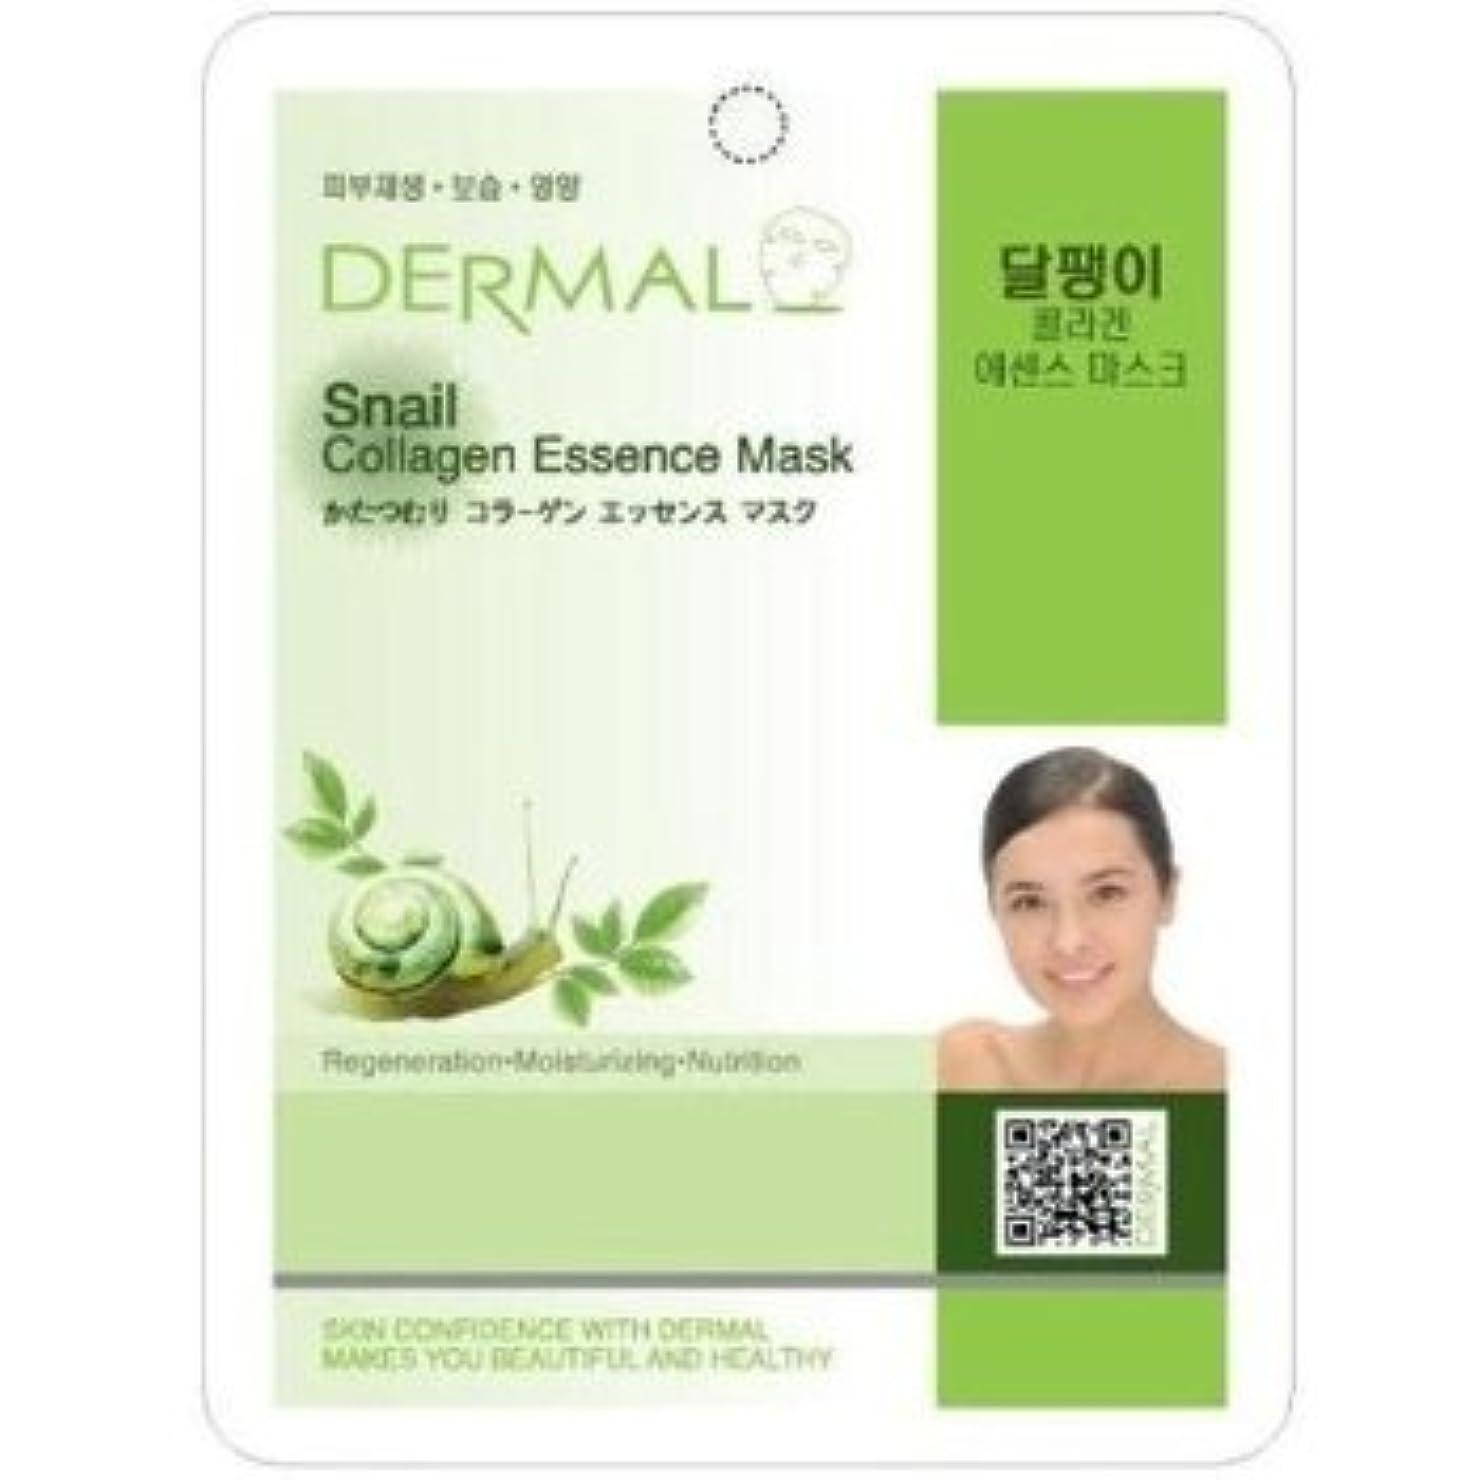 Dermal Korea Collagen Essence Full Face Facial Mask Sheet - Snail (100 pcs, 1box)